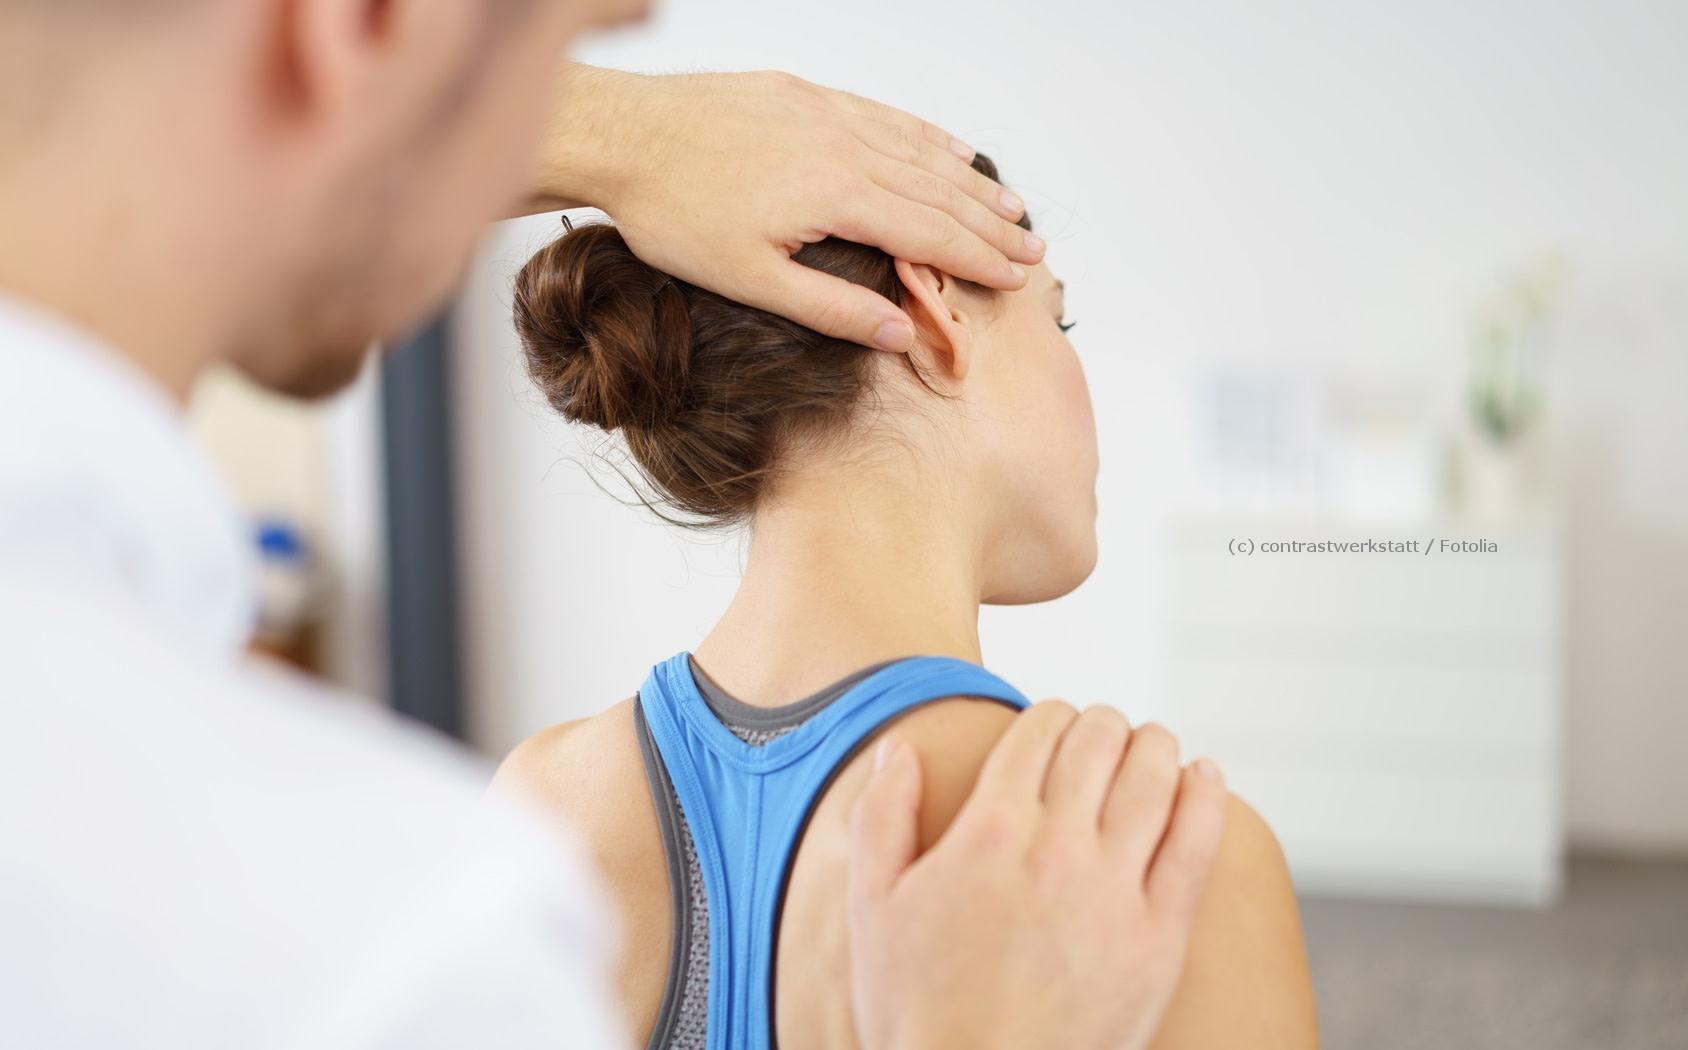 Ostheopathie  c  contrastwerkstatt fotoliayy9peb